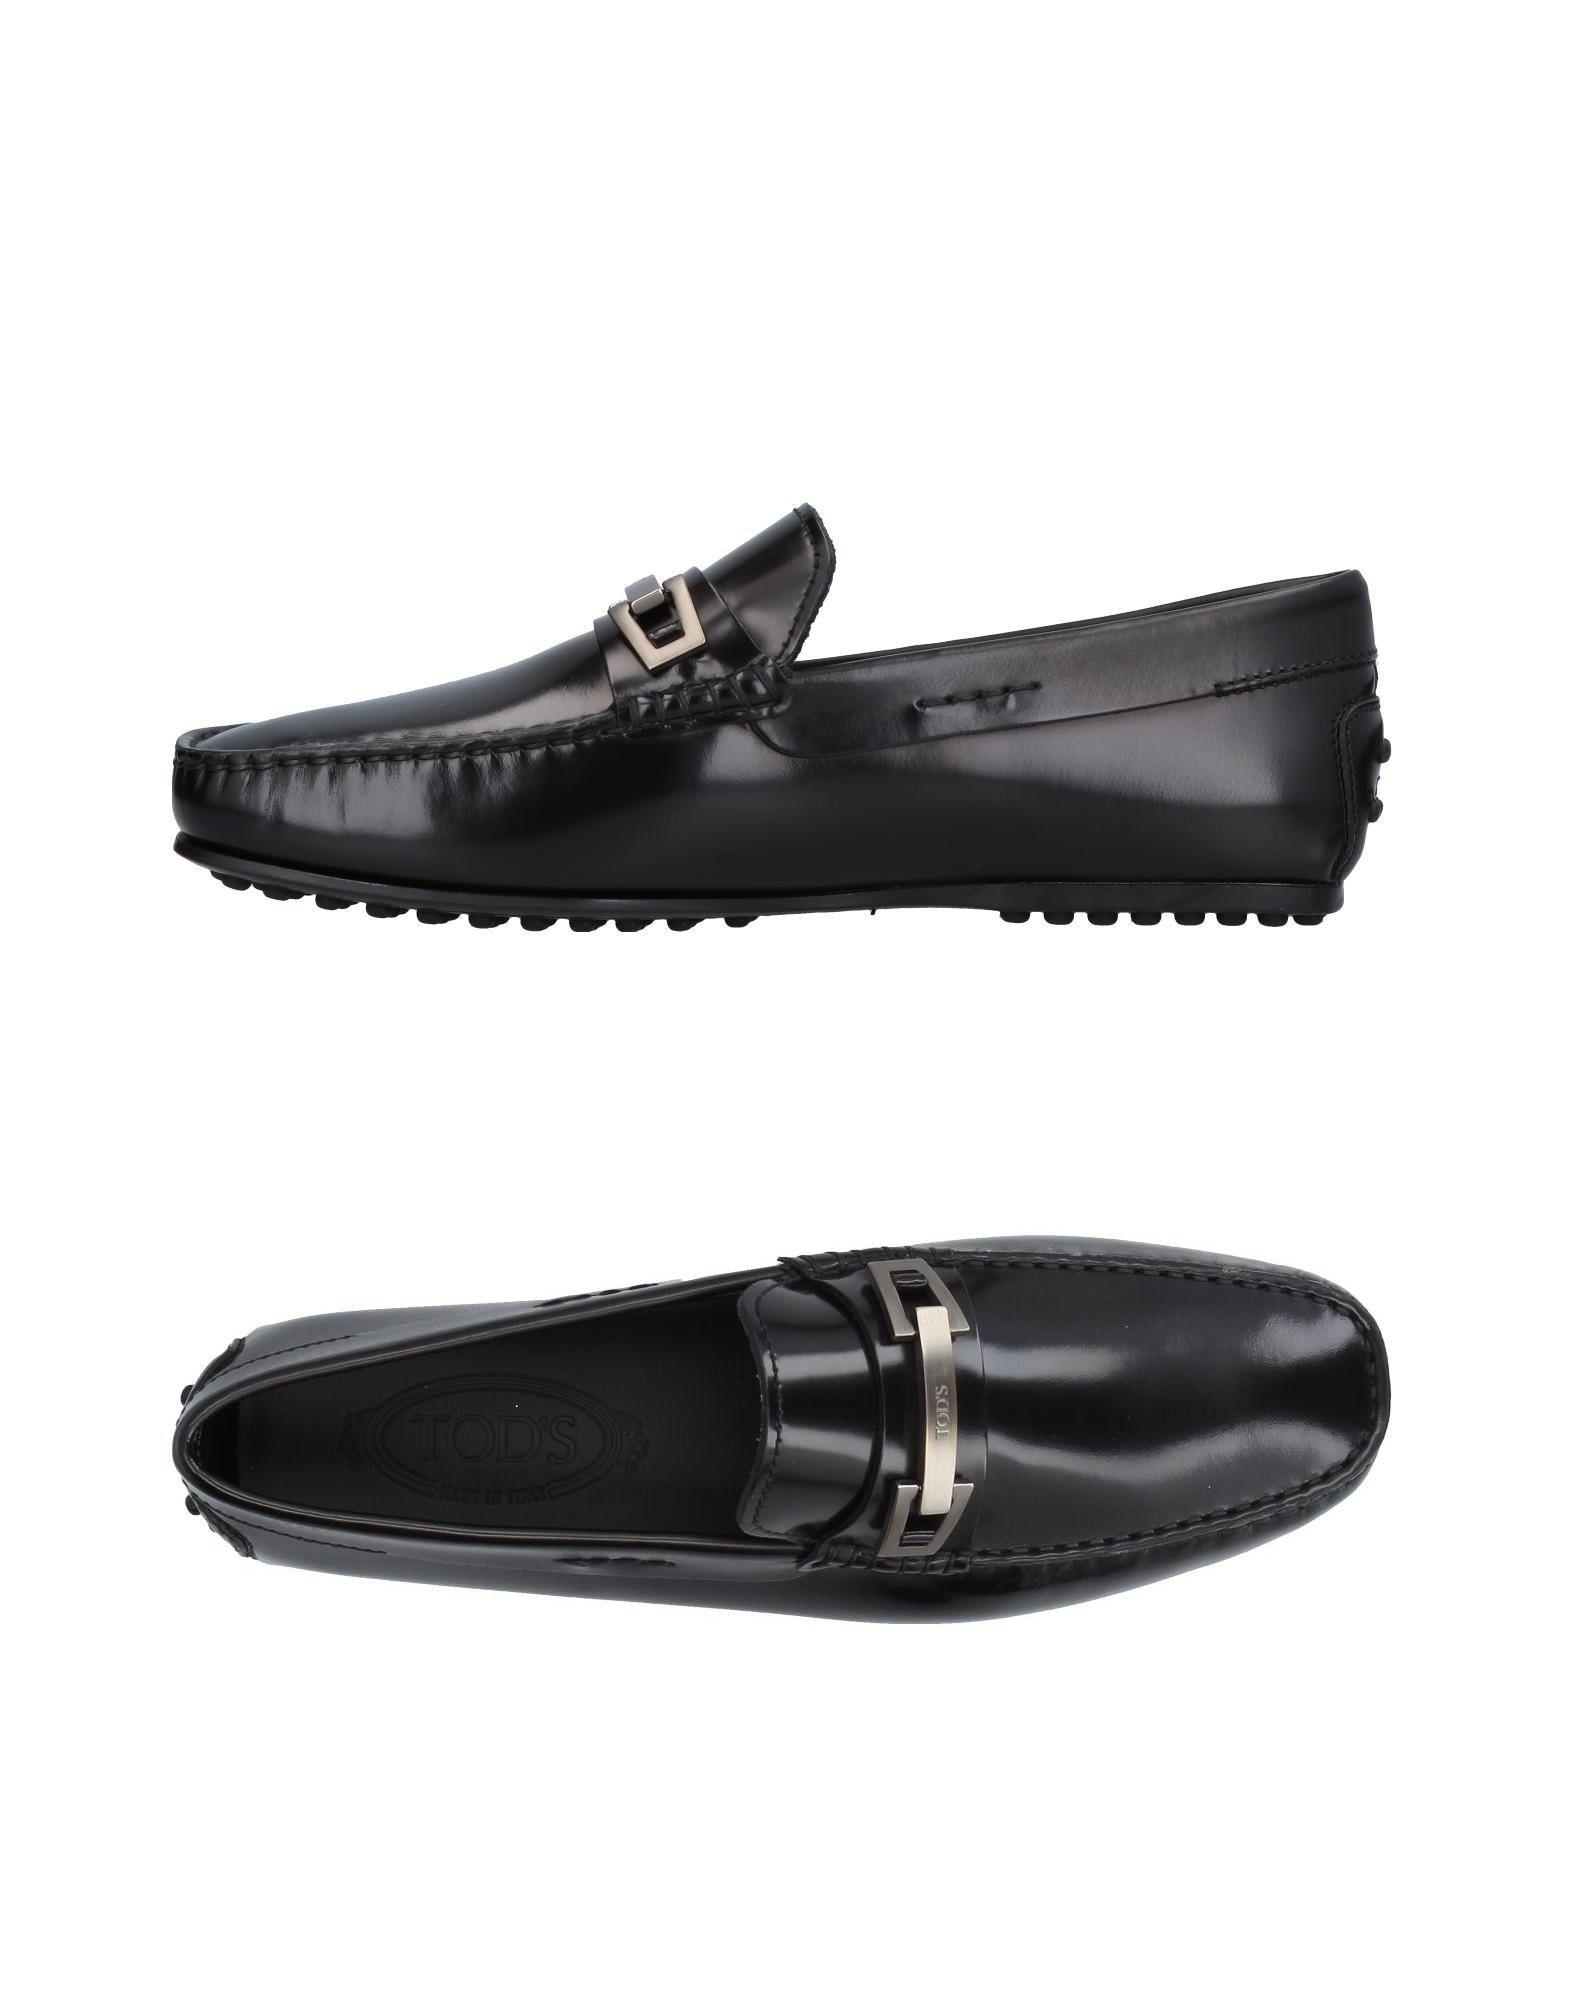 Tod's Mokassins Herren  11397817VJ Gute Qualität beliebte Schuhe